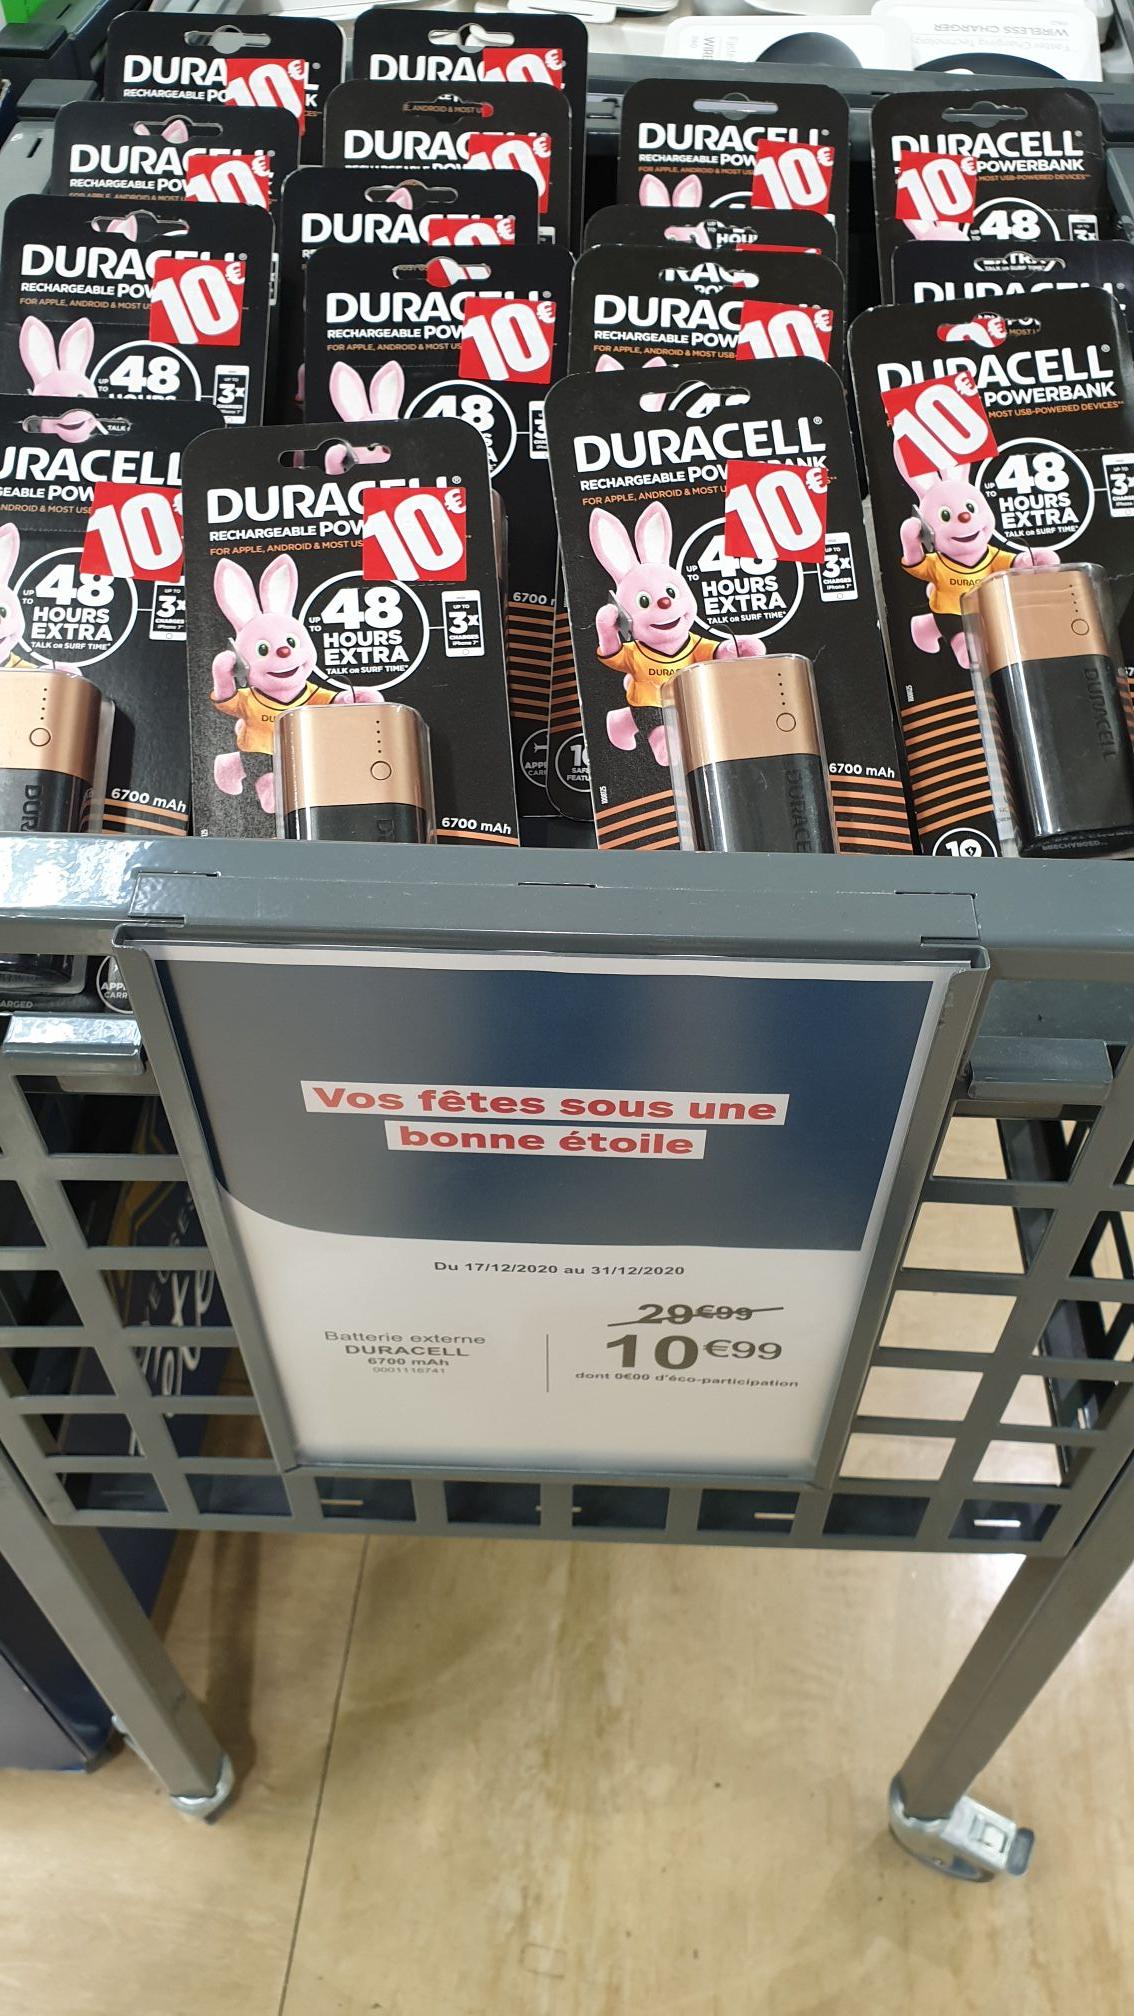 Batterie externe Duracell - Boulanger La garde (83)